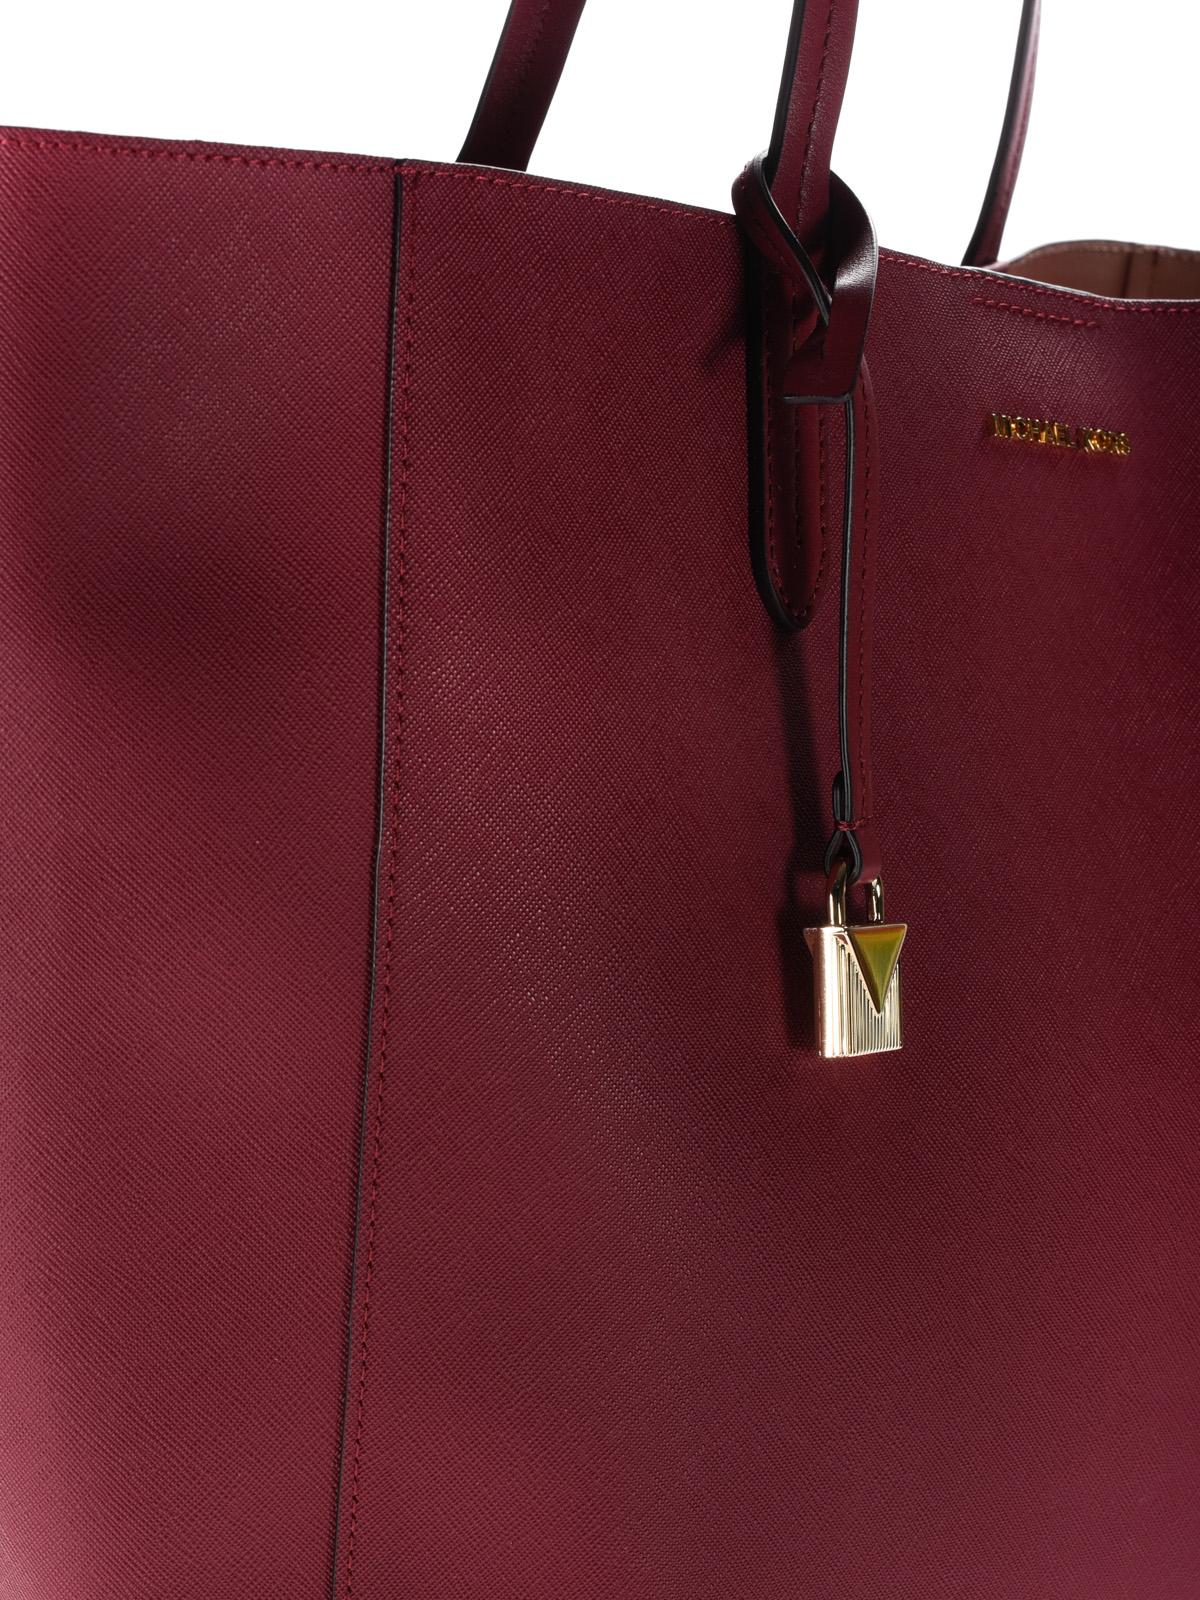 91fbf6731c30 Michael Kors - Penny coated twill convertible bag - totes bags ...